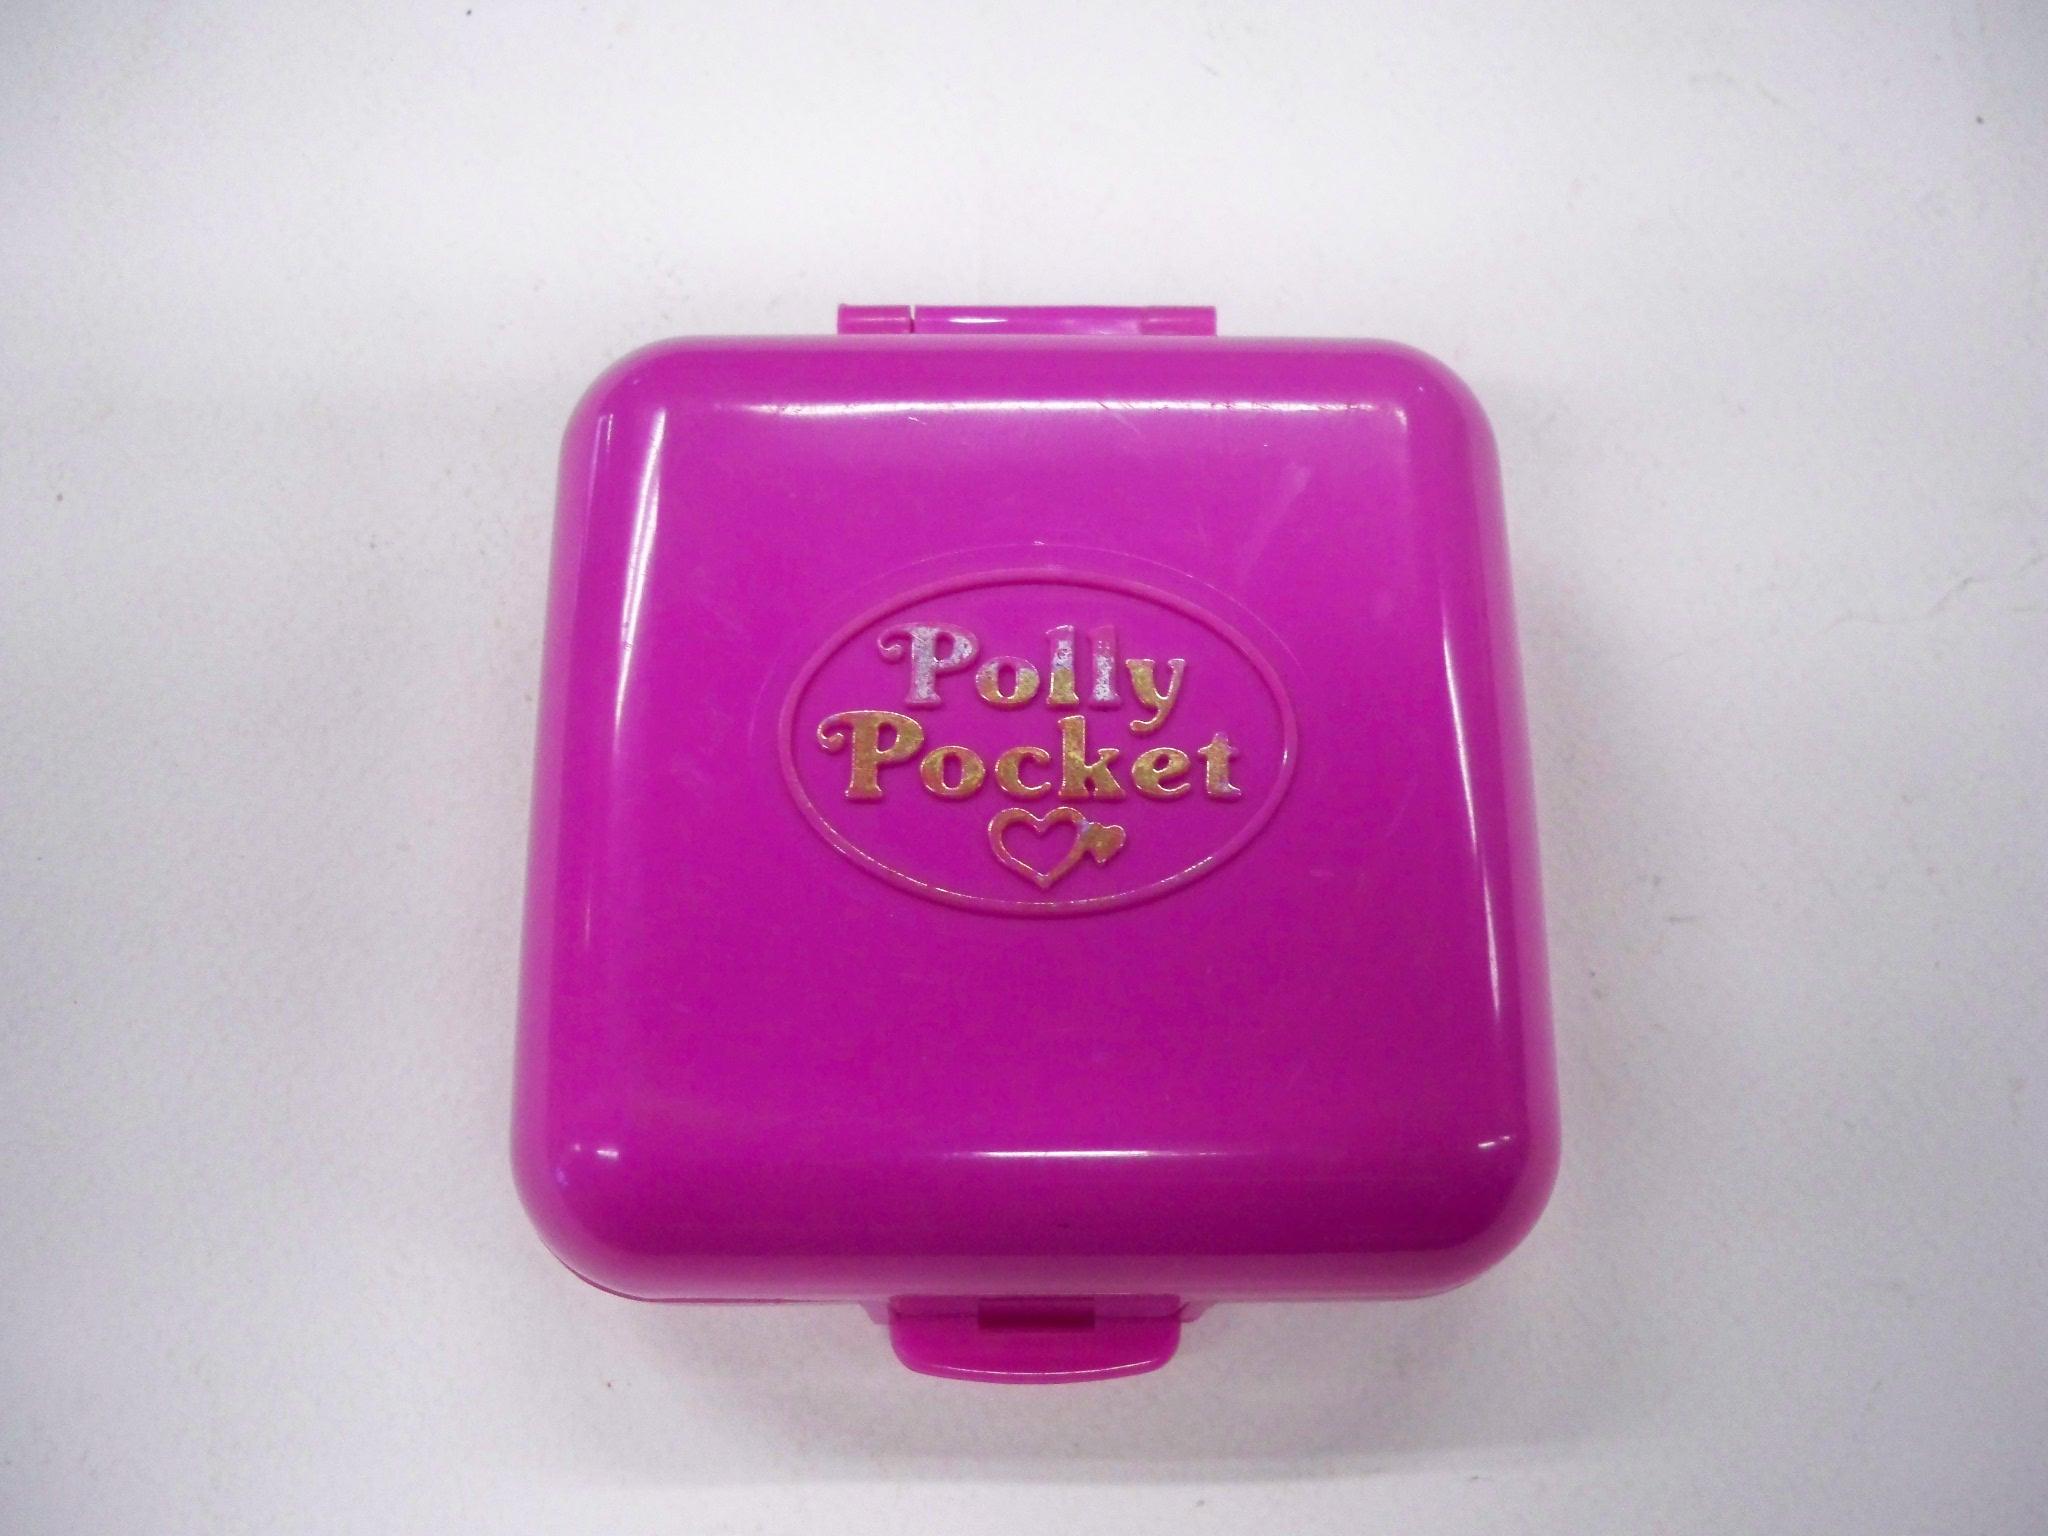 polly pocket กล่องสี่เหลี่ยมสีชมพู